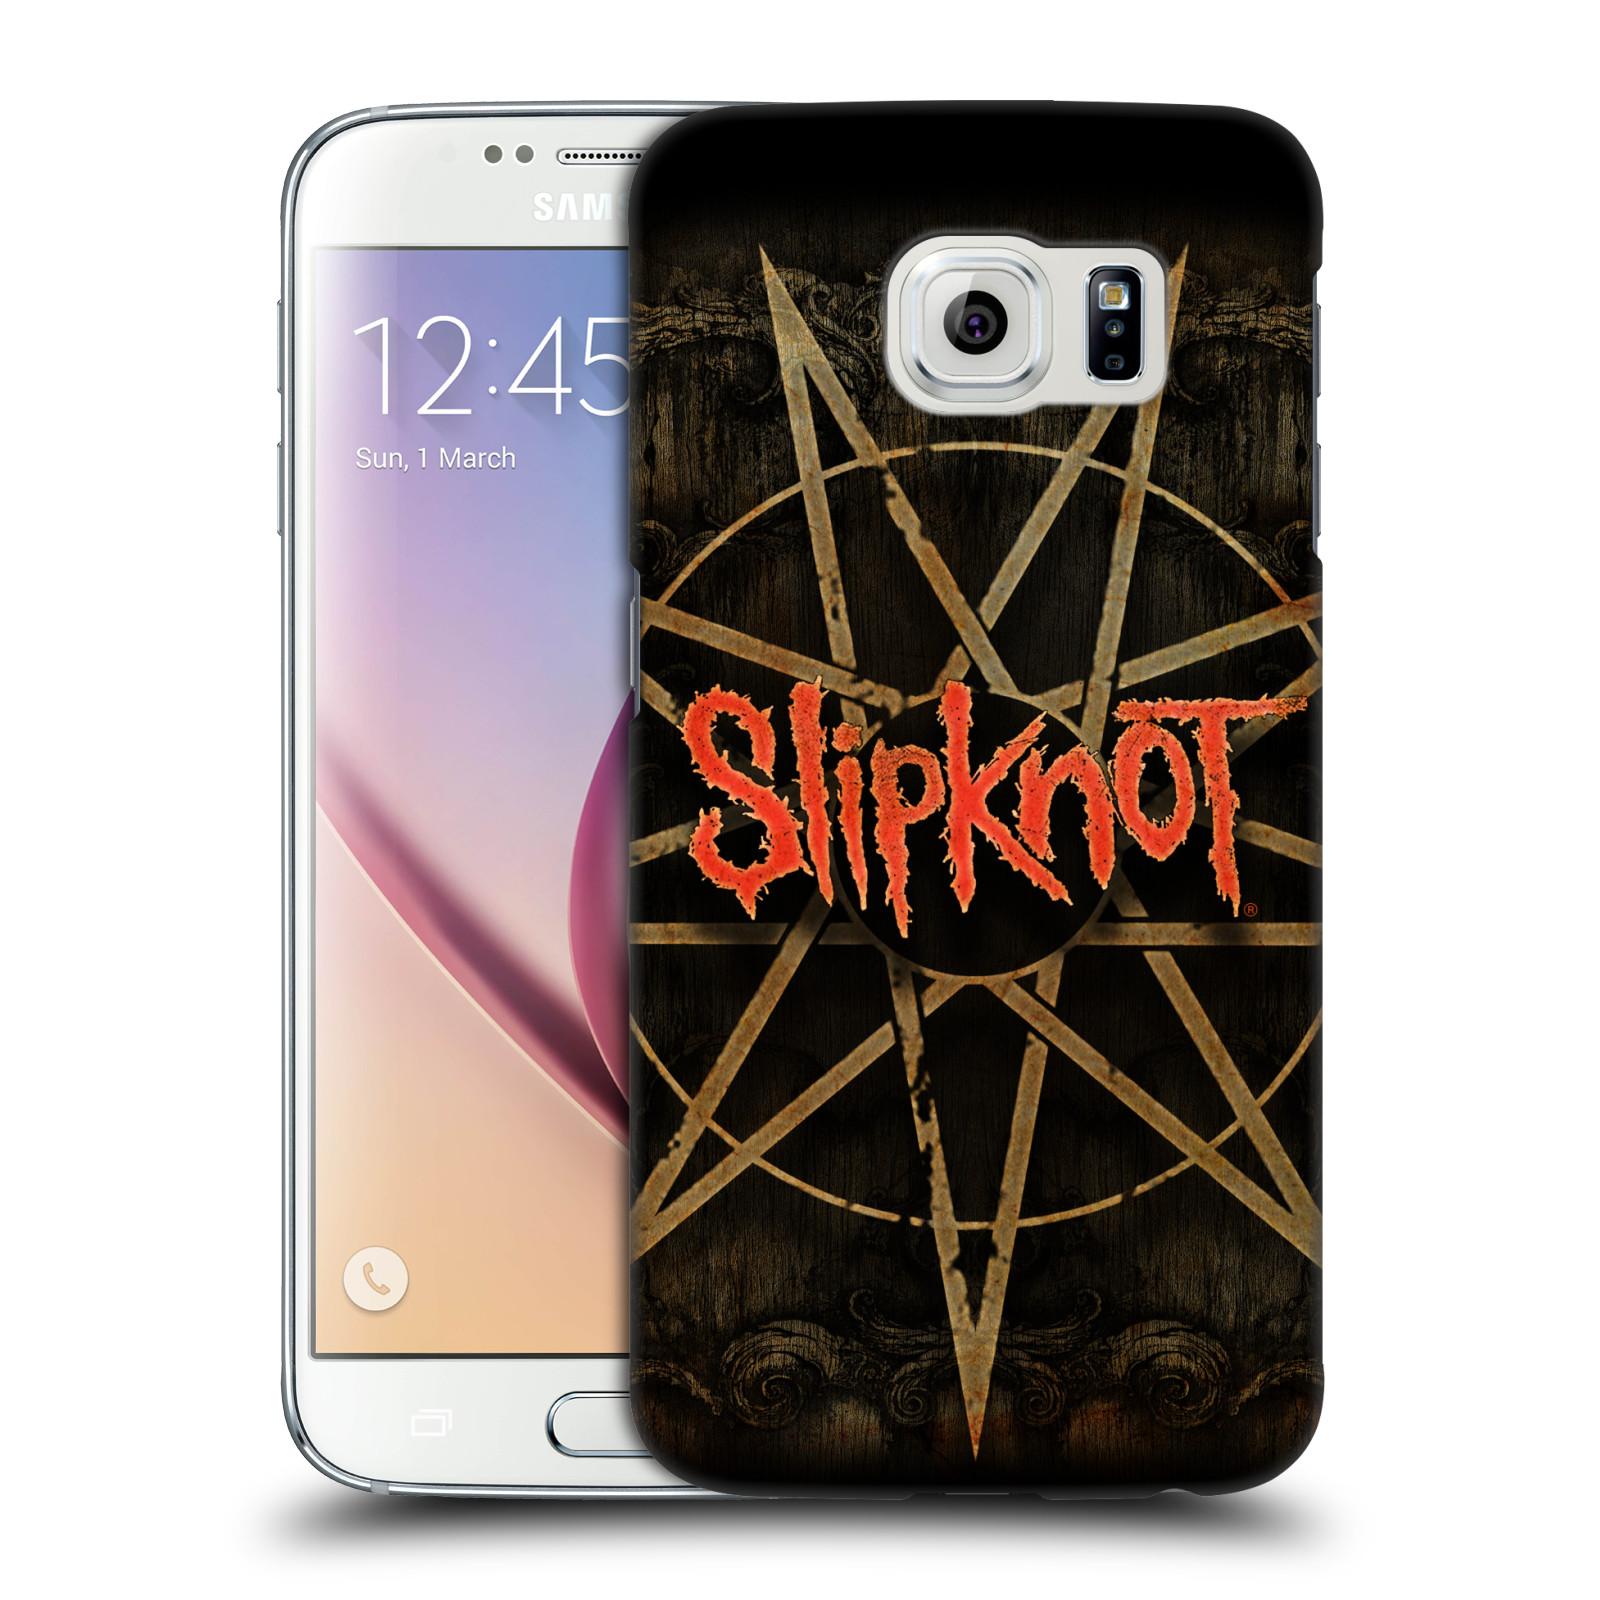 Plastové pouzdro na mobil Samsung Galaxy S6 HEAD CASE Slipknot - Znak